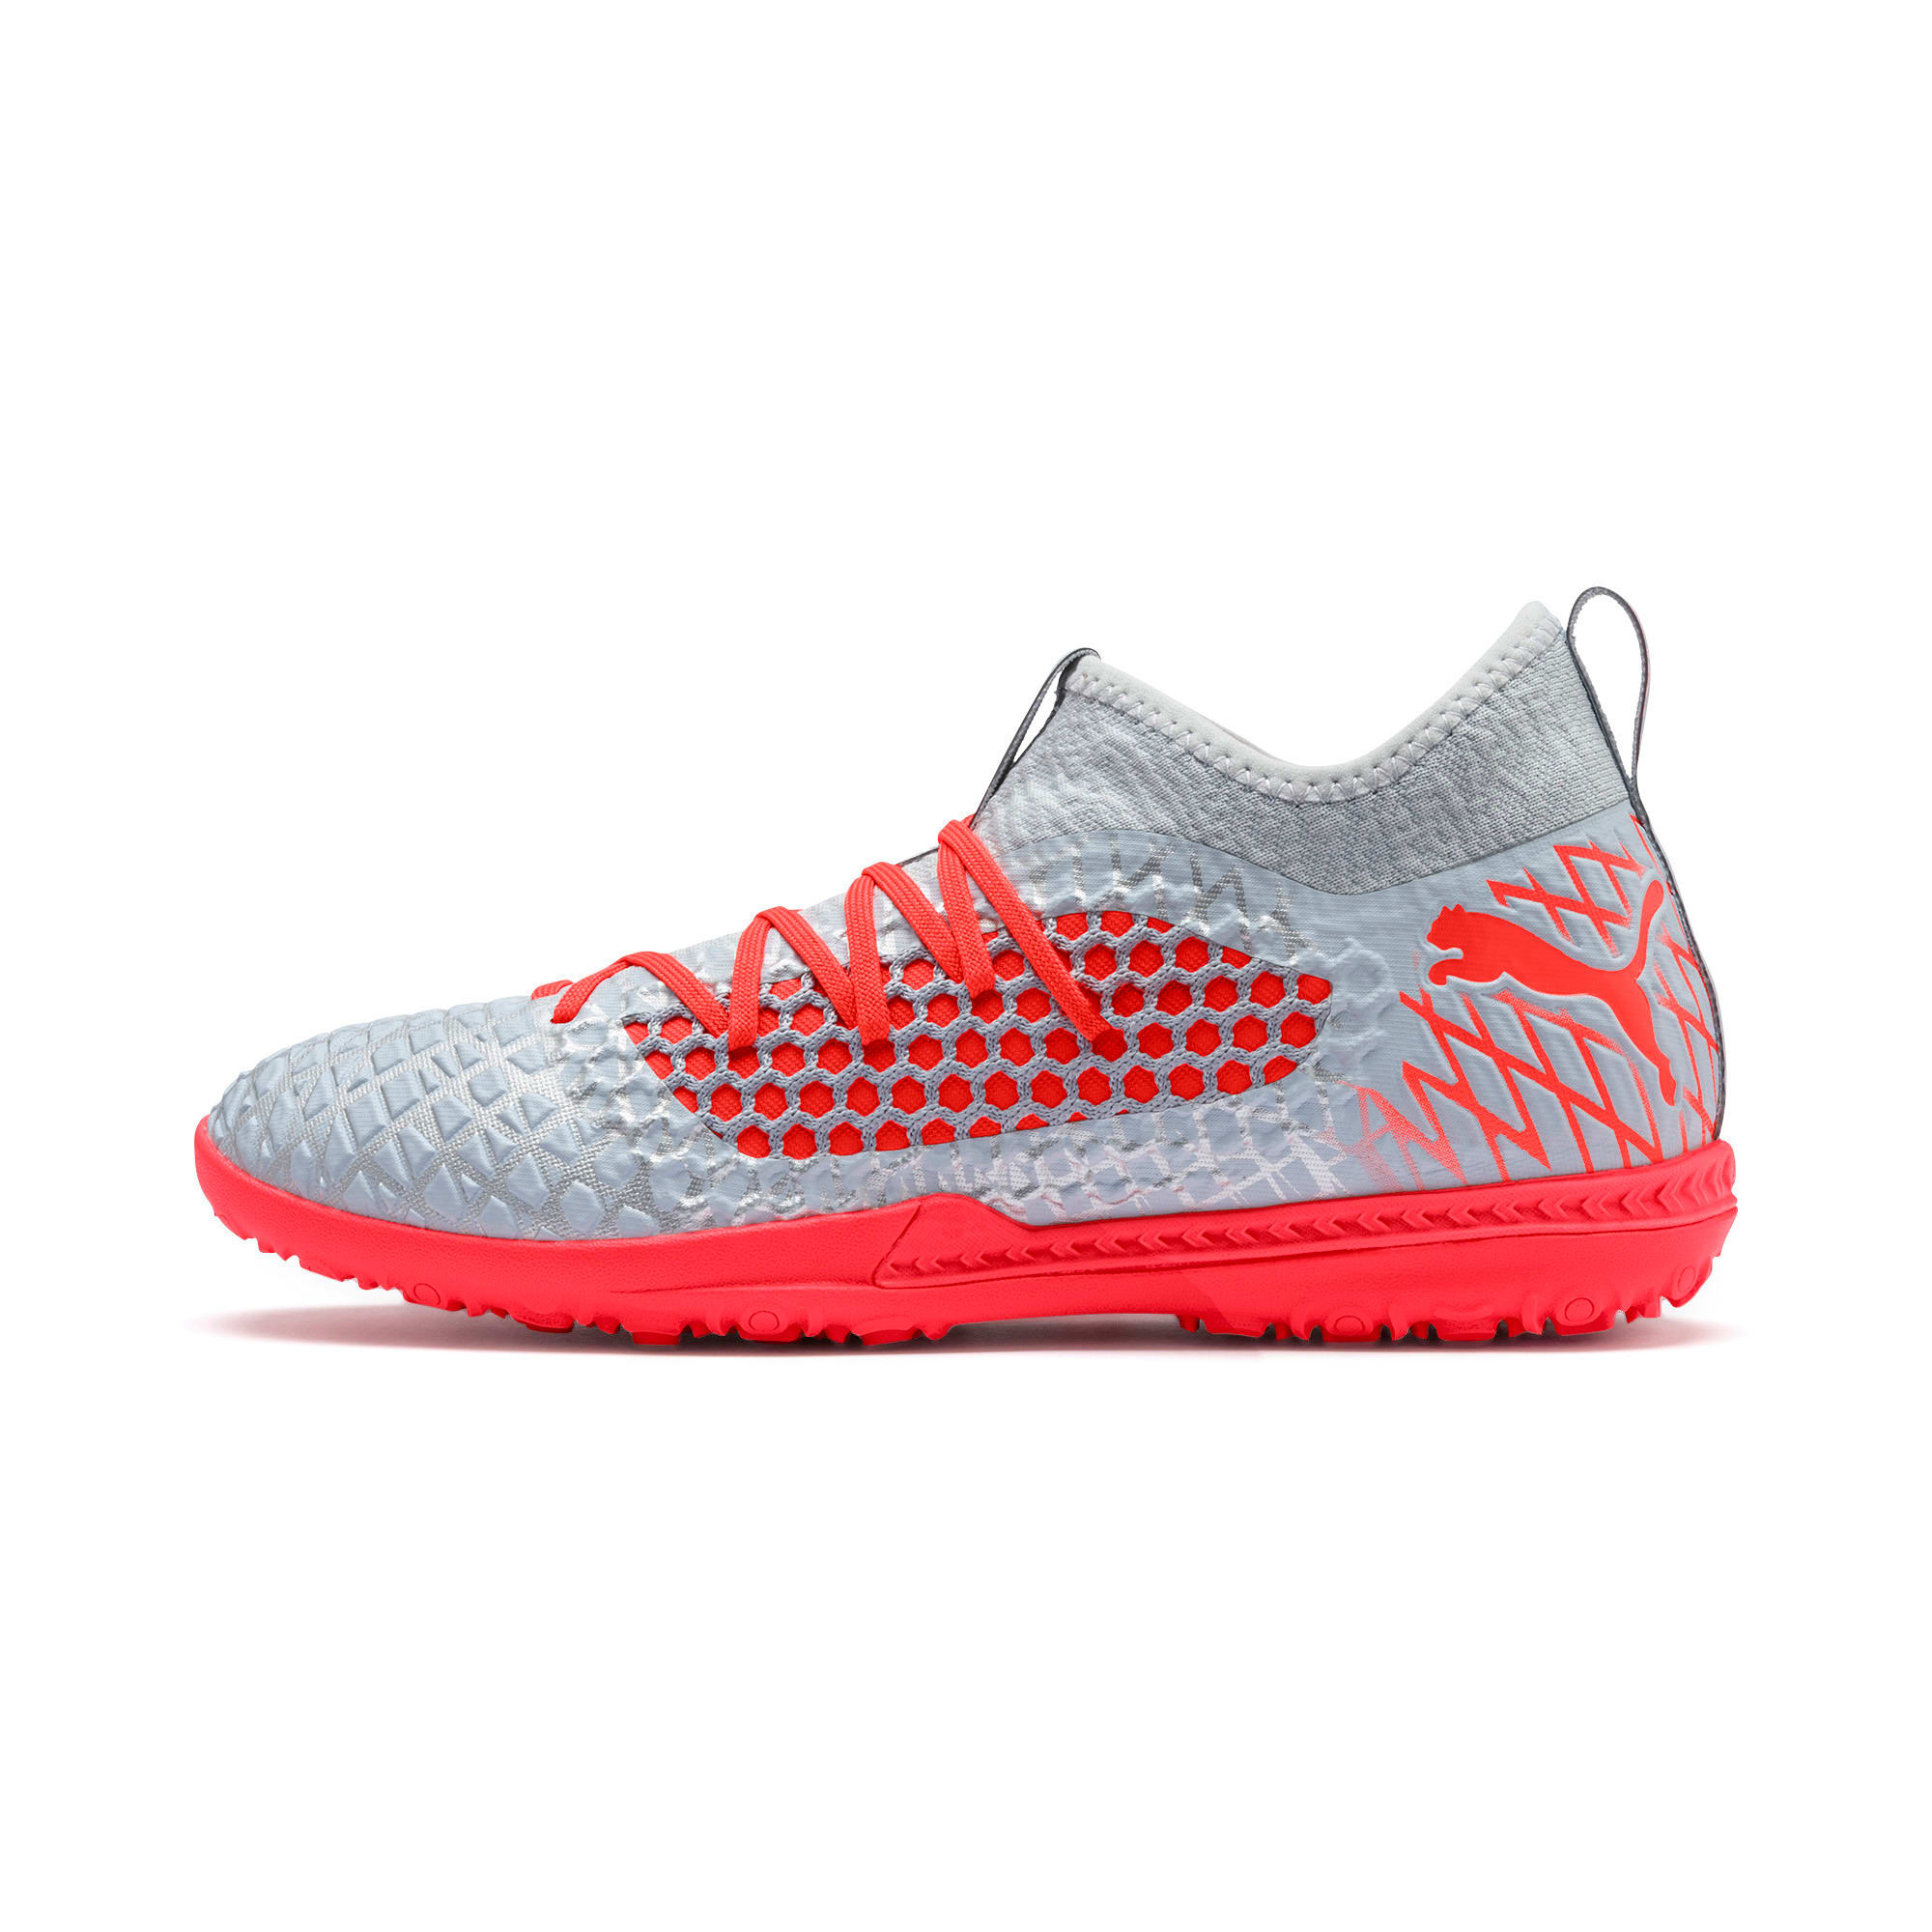 Thumbnail 1 of FUTURE 4.3 NETFIT TT Men's Soccer Shoes, Glacial Blue-Nrgy Red, medium